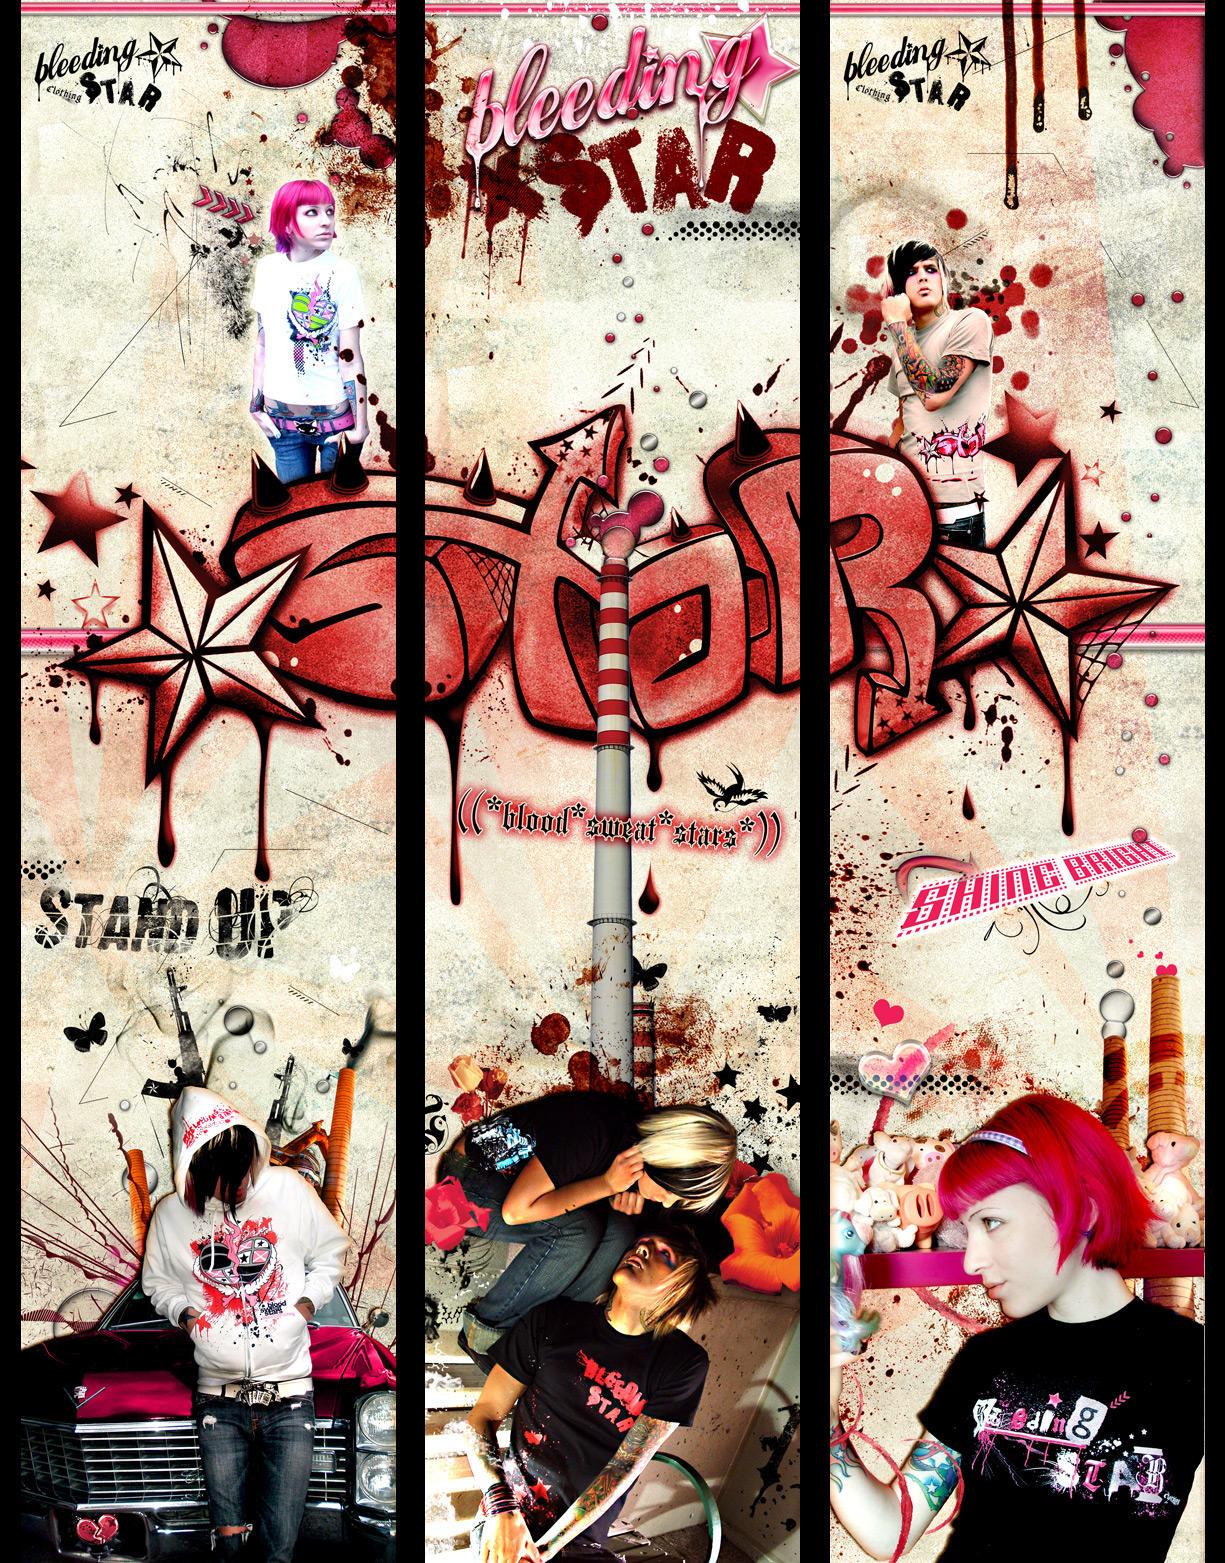 3 banner Set by BleedingStarClothing